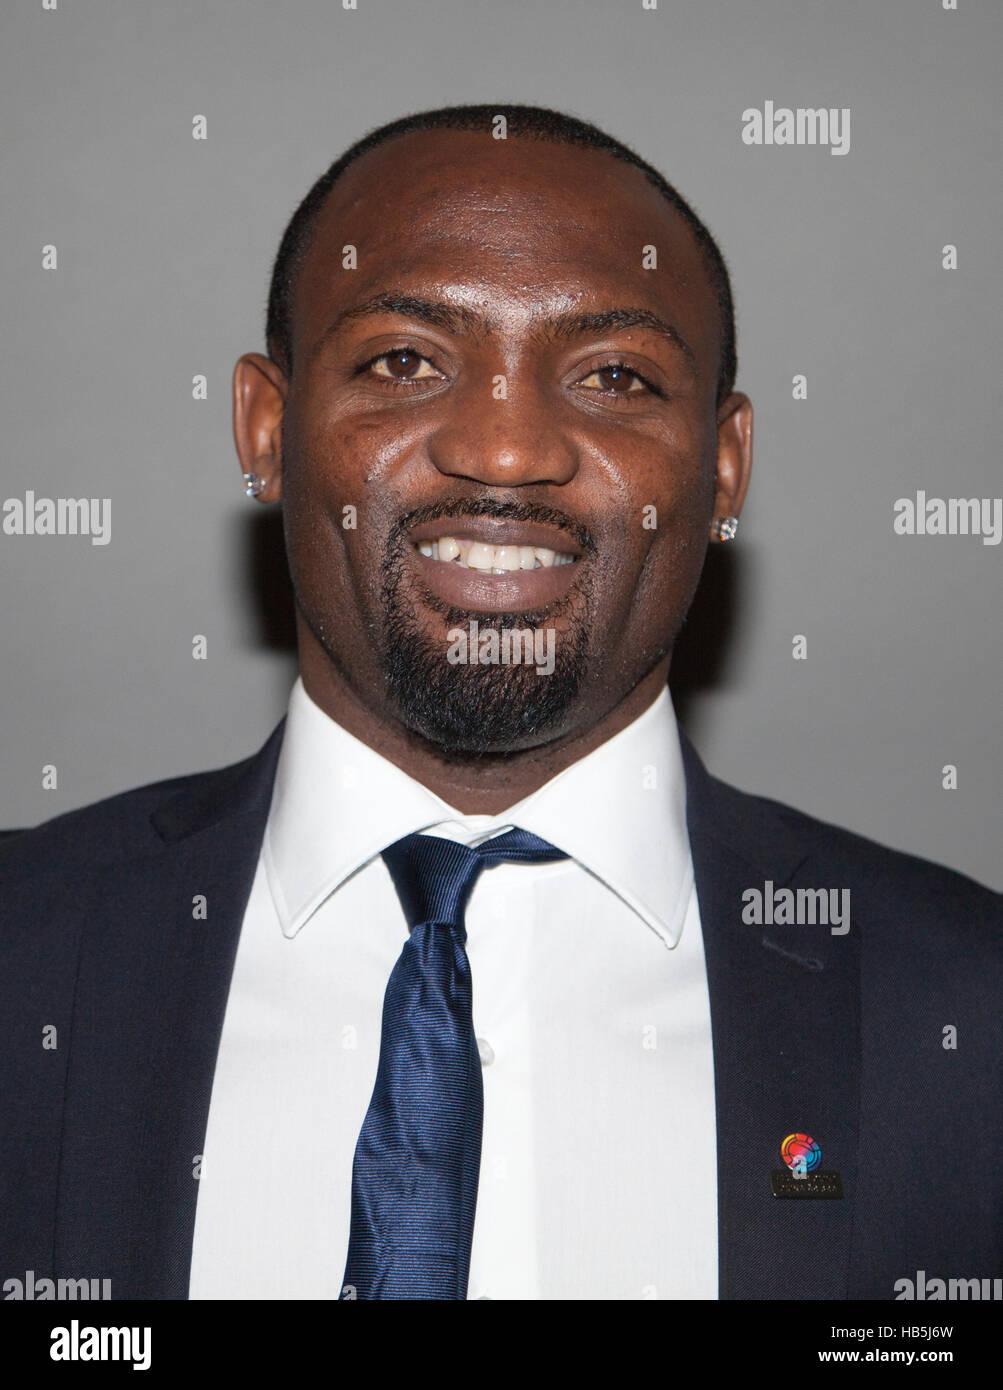 JOHN OWOERI Nigerian professional football player in Sweden s BK Häcken 2016 and winner as the seasons - Stock Image